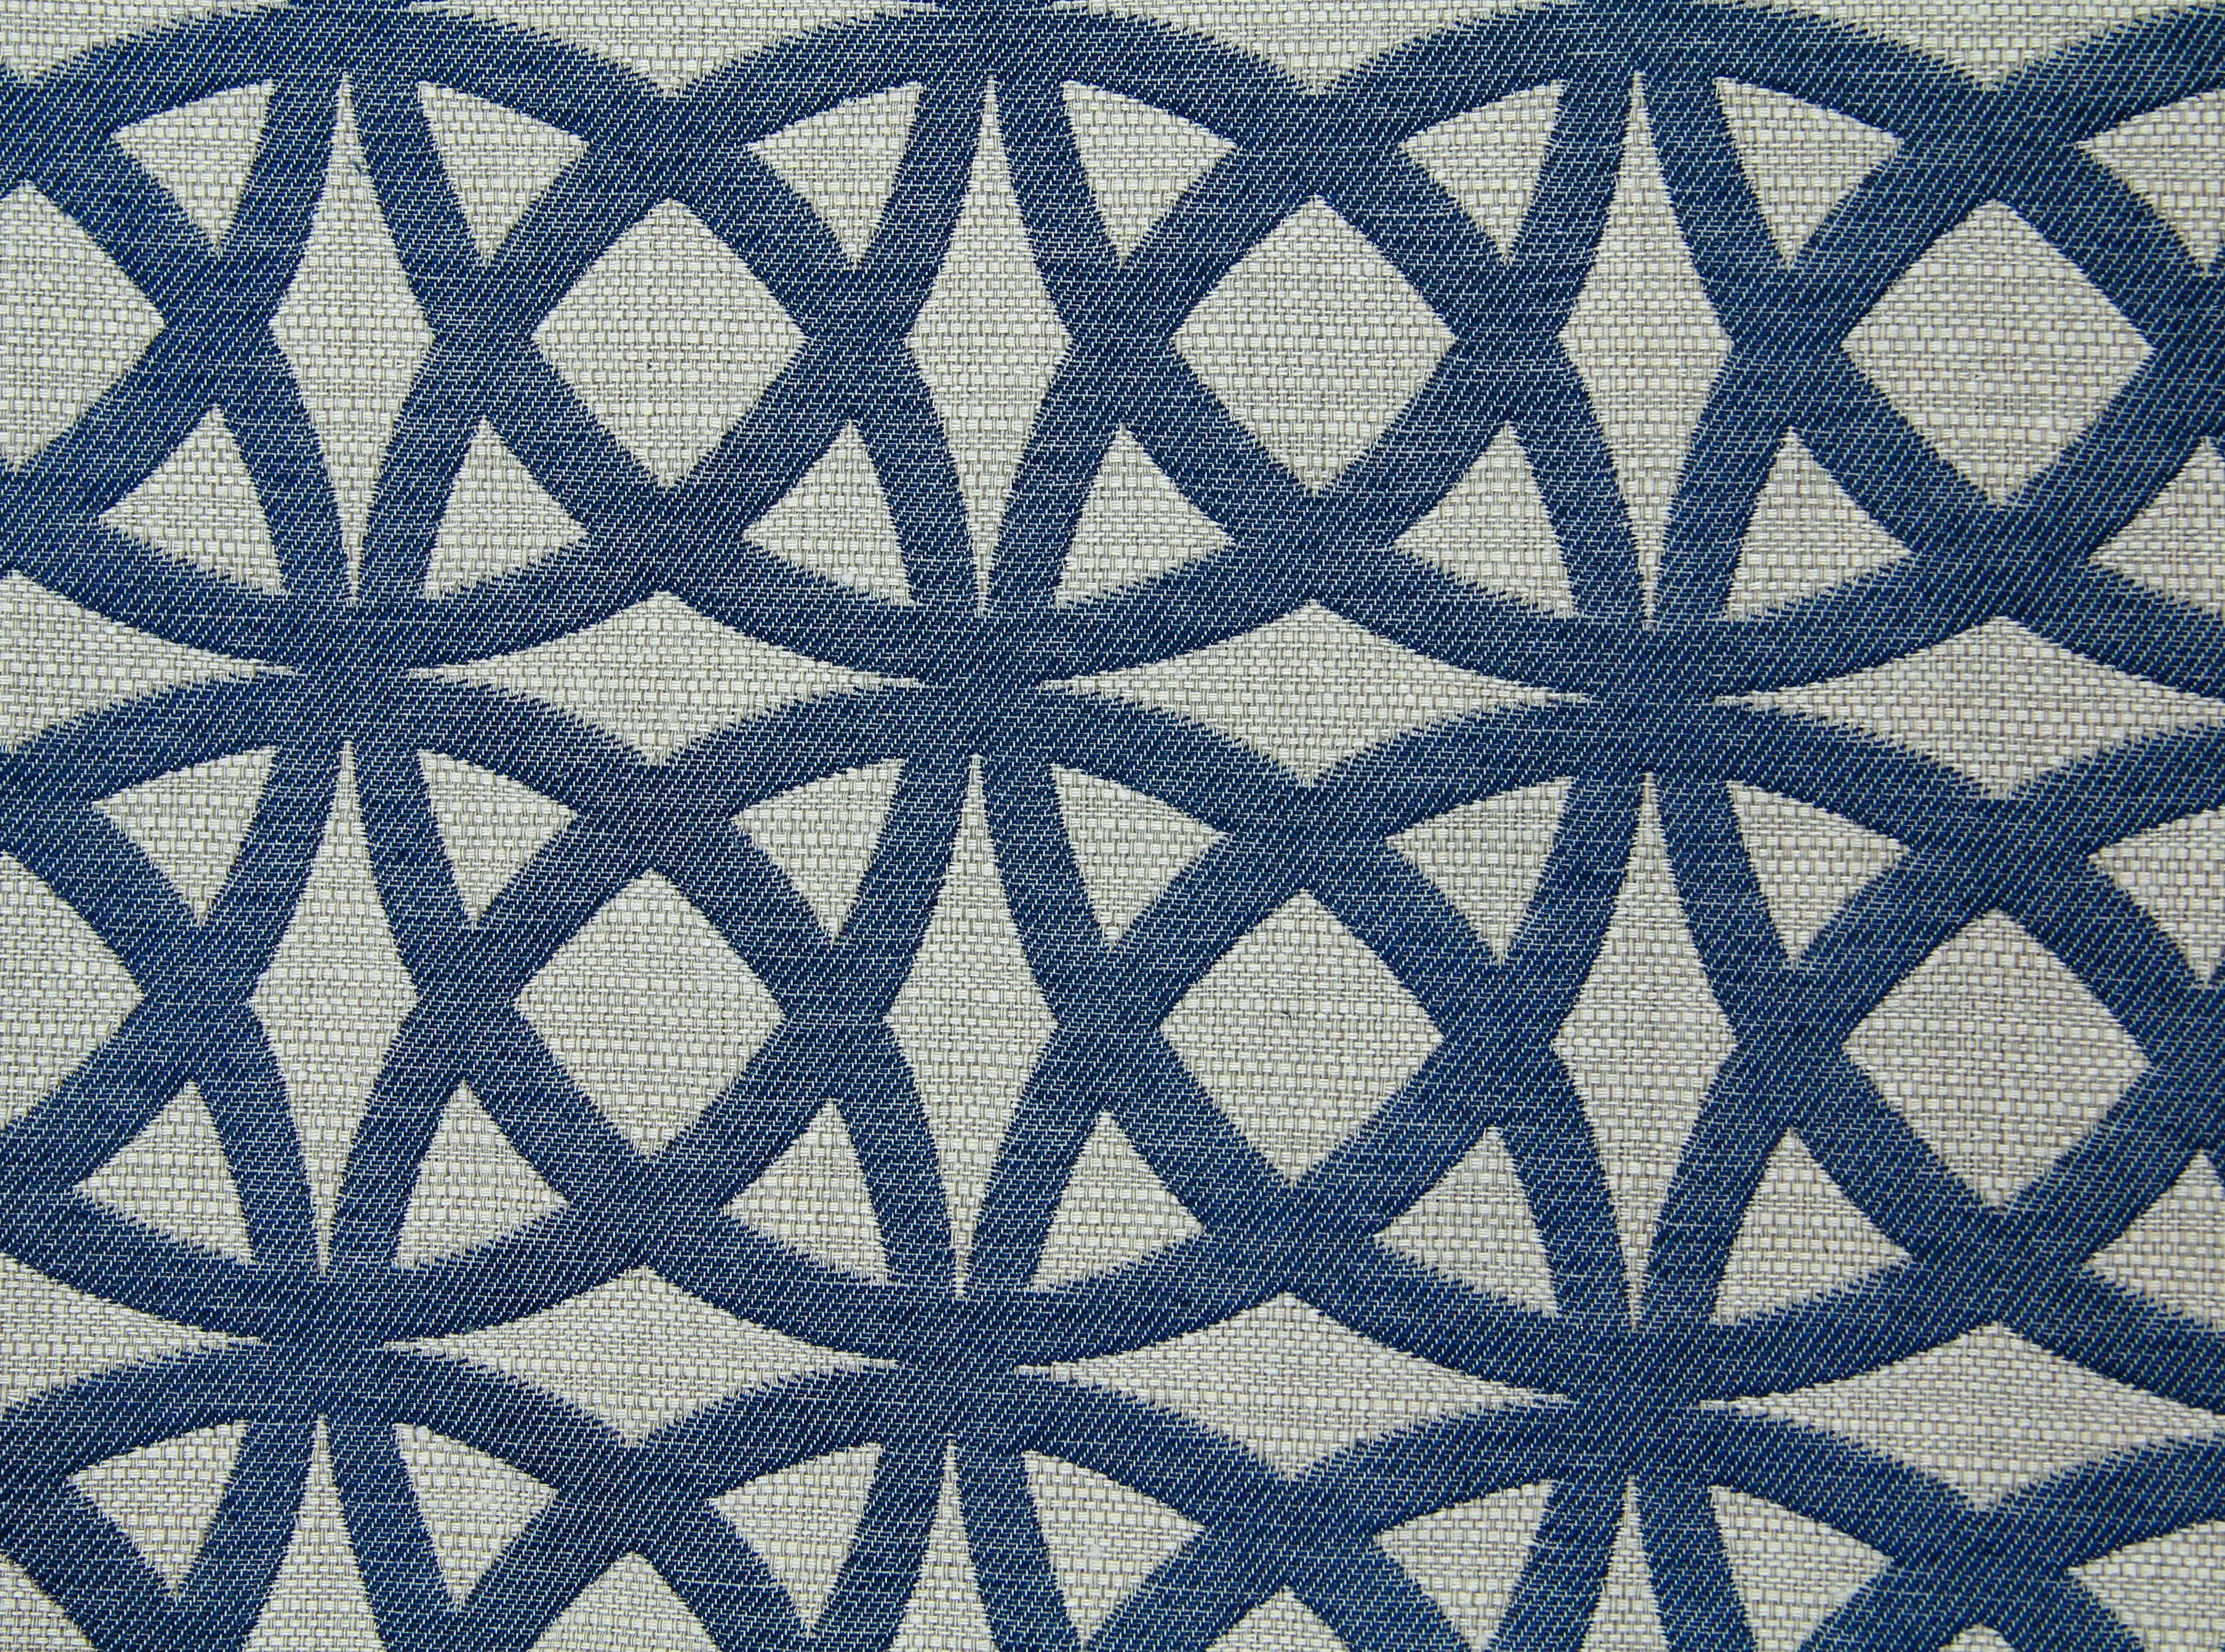 fabric texture blue circle pattern vintage photo - TextureX- Free ...